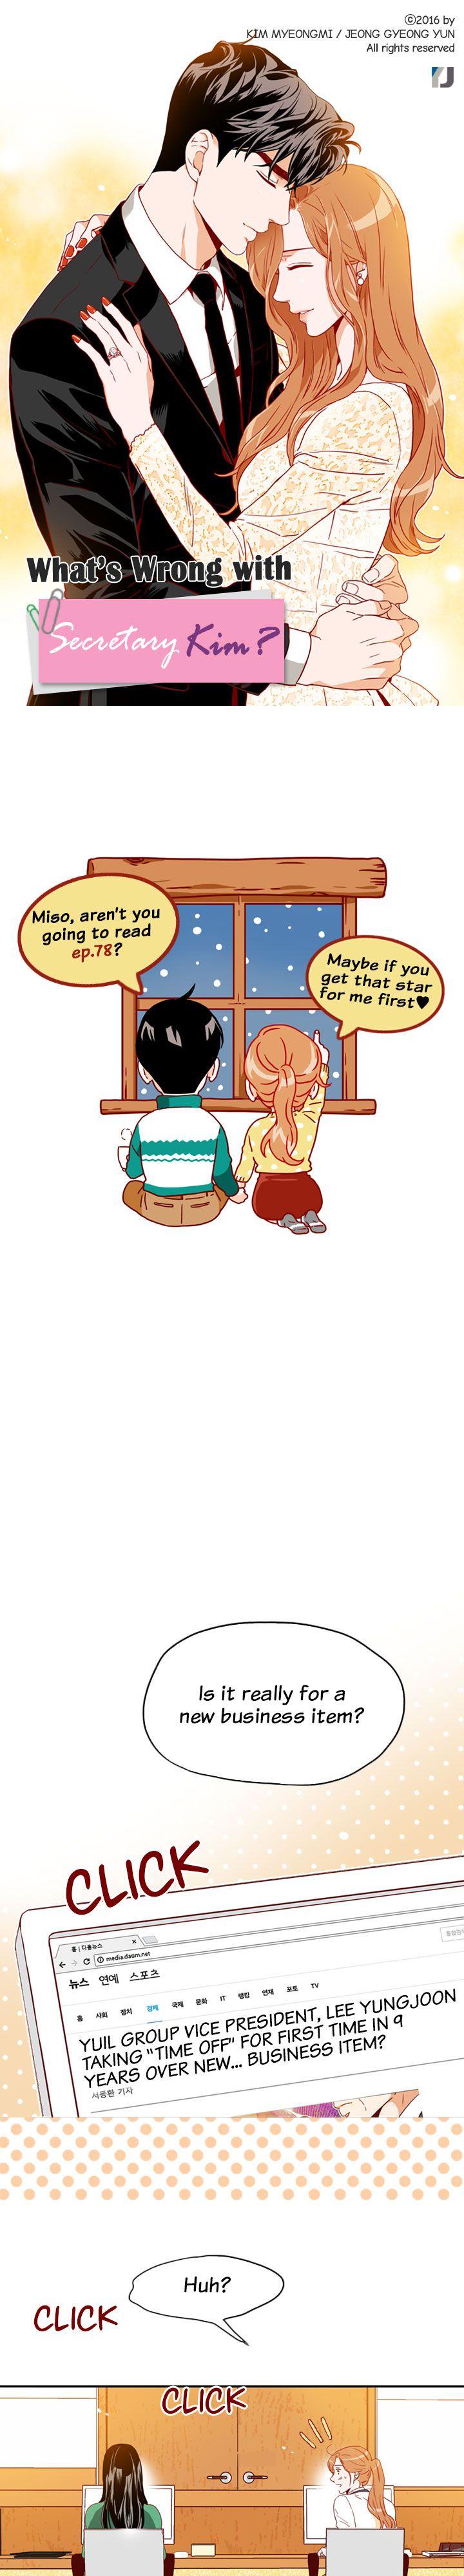 https://manga.mangadogs.com/comics/pic2/15/25807/960735/37a846c5cca3fd0057eefecccb870855.jpg Page 1